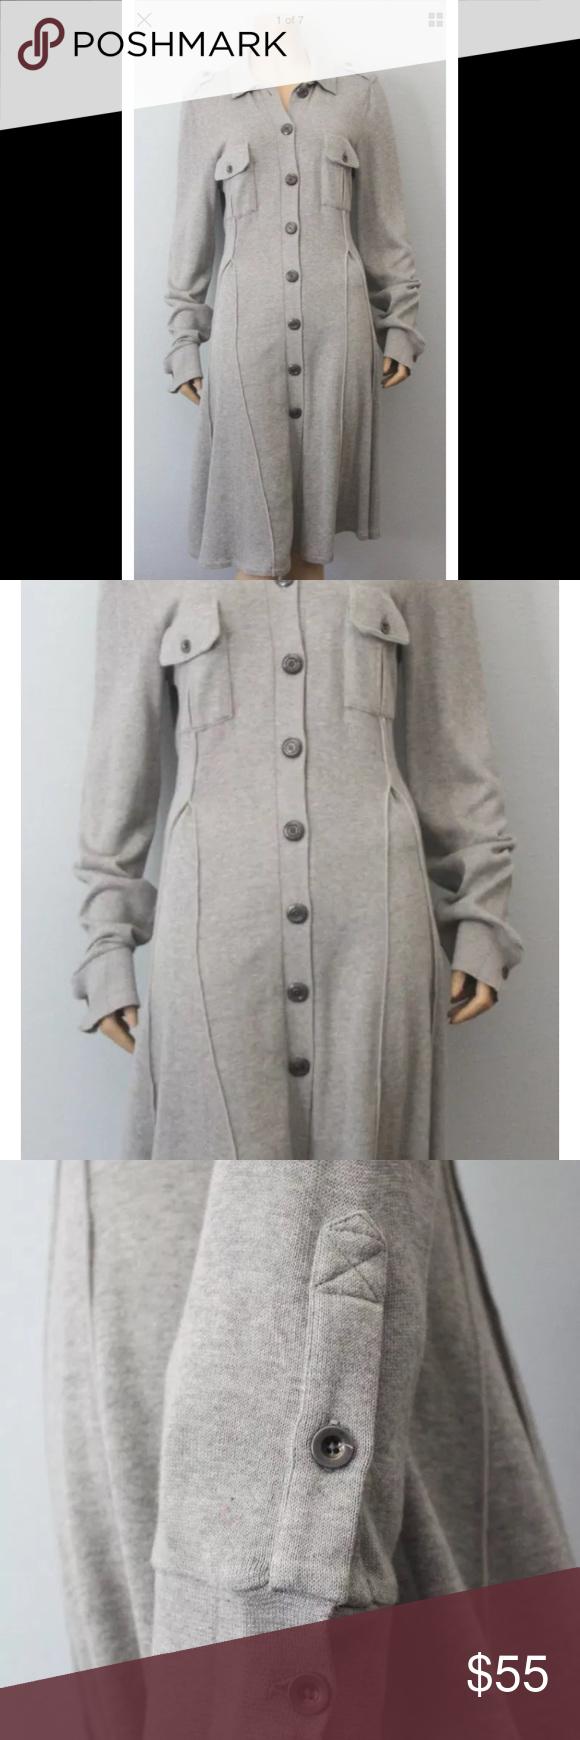 Free People Gray Button Down Sweater Dress Xs My Posh Picks